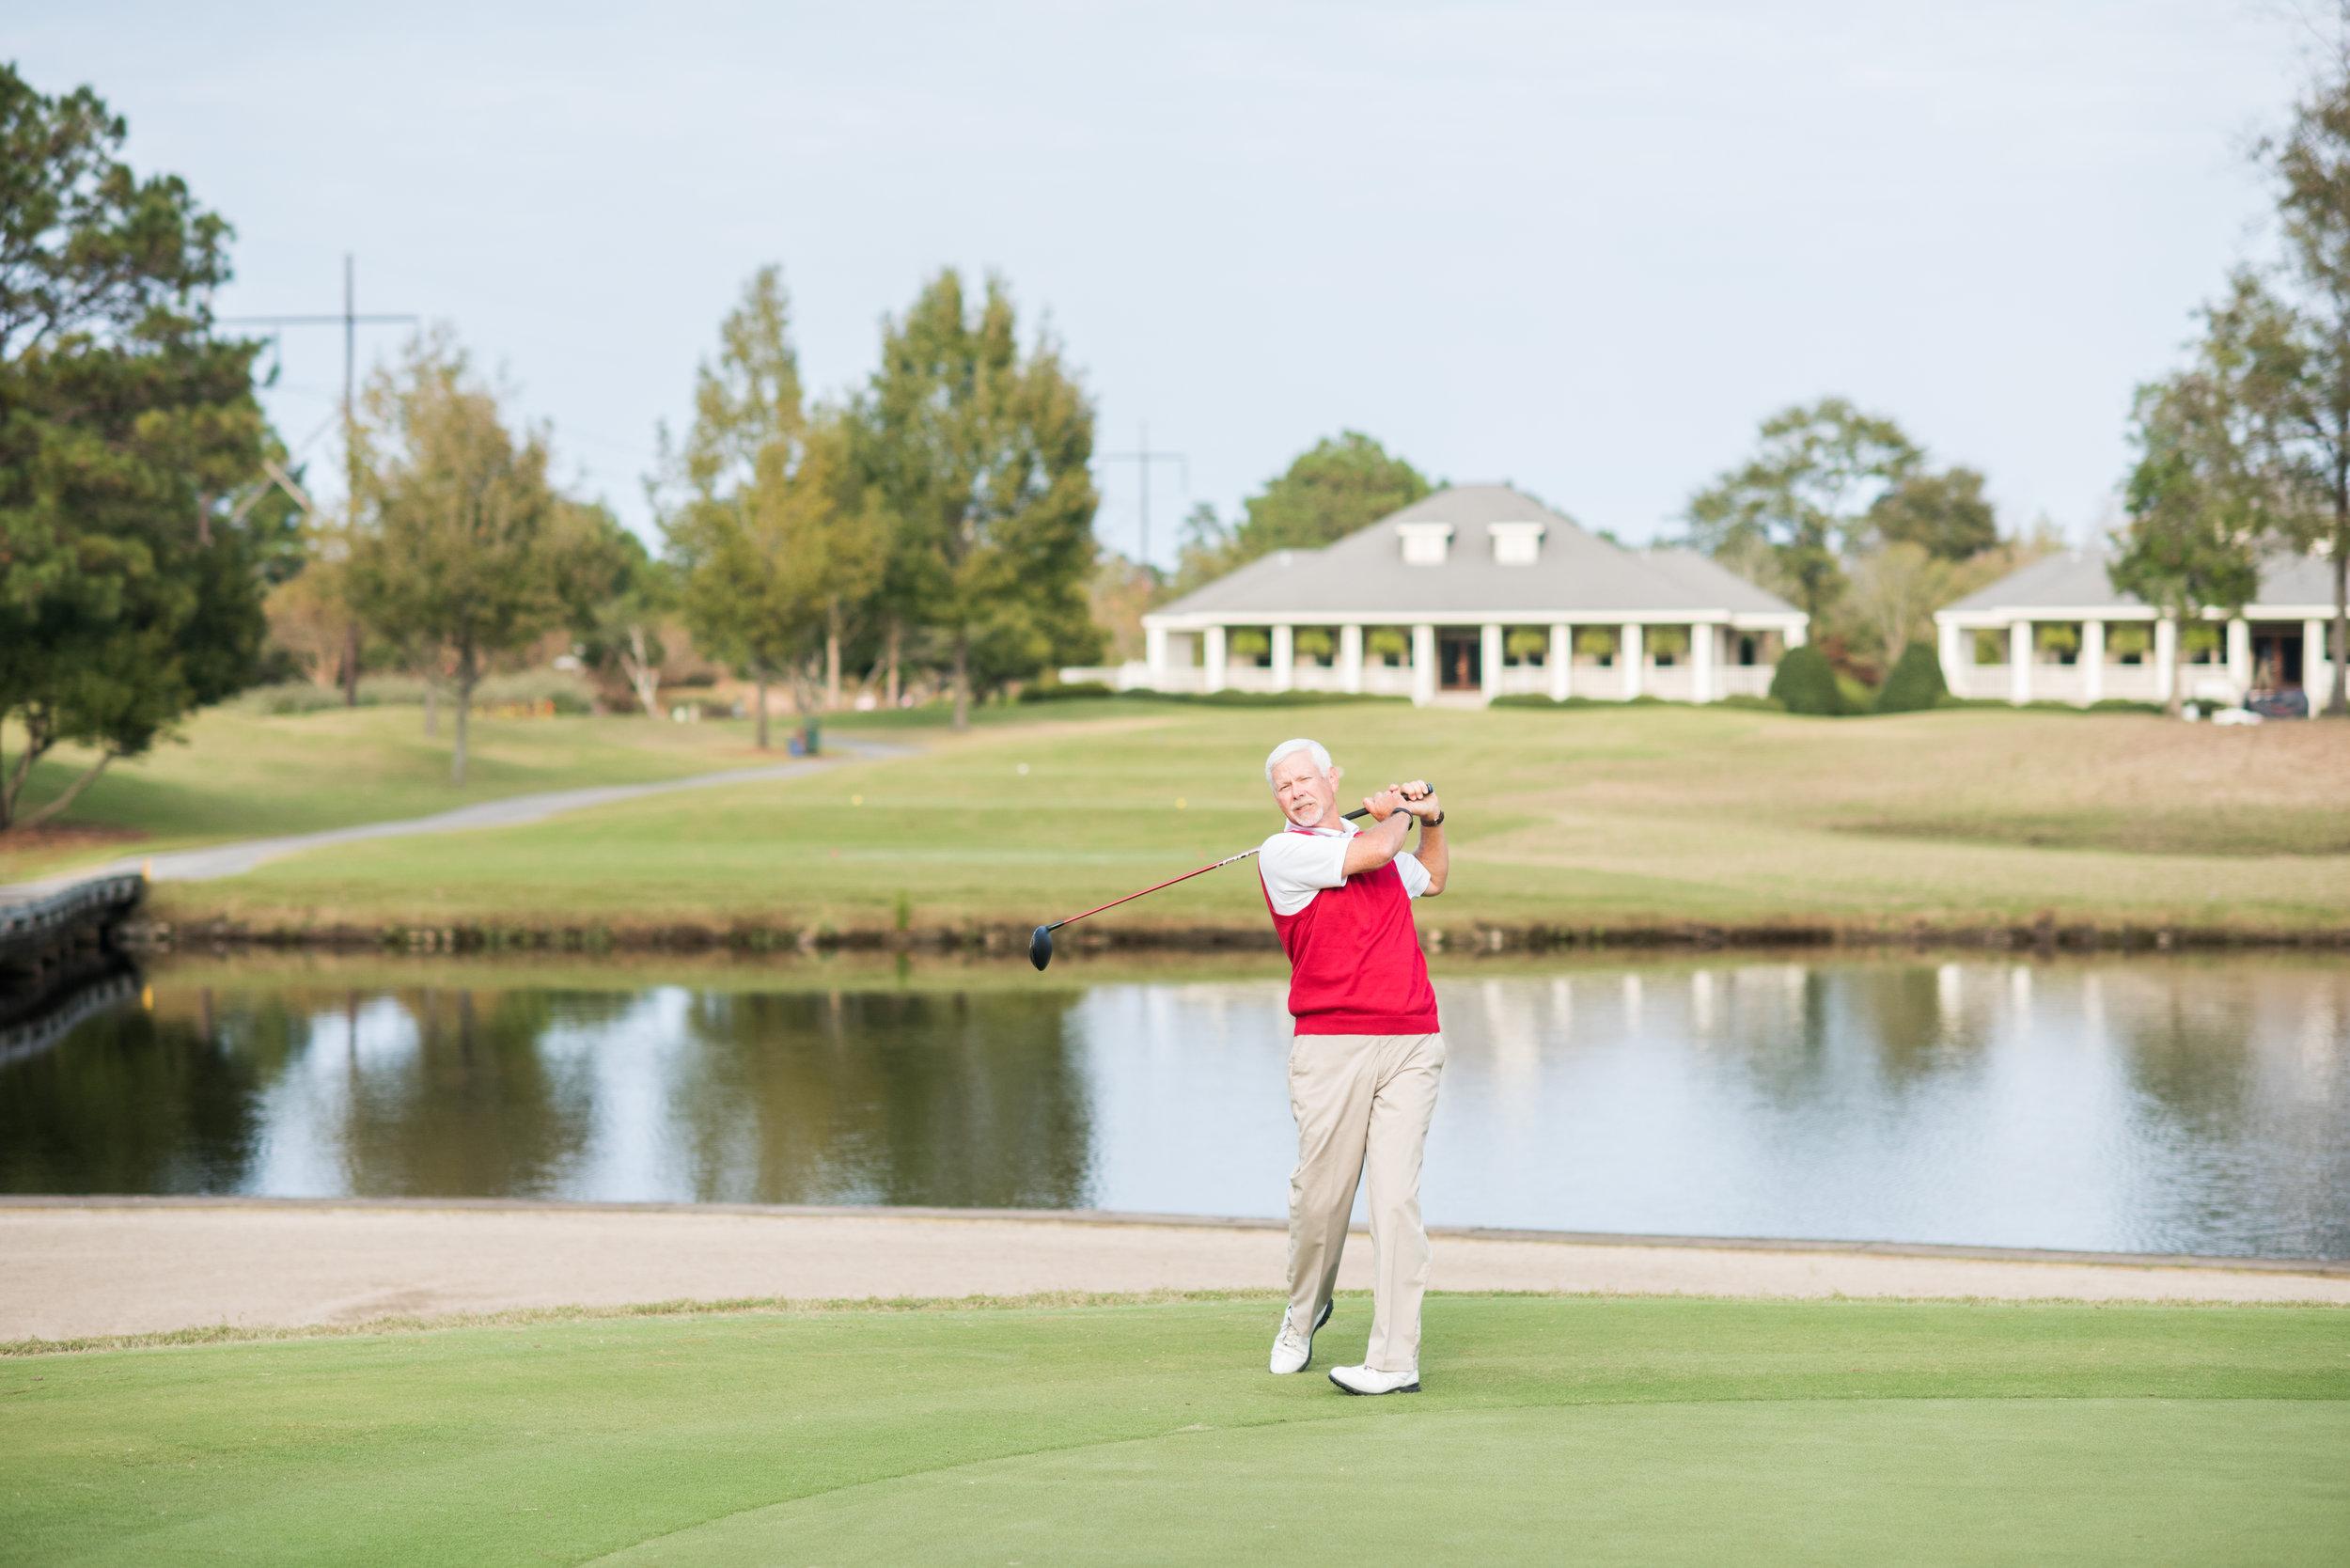 river-landing-north-carolina-full-golf-membership.jpg